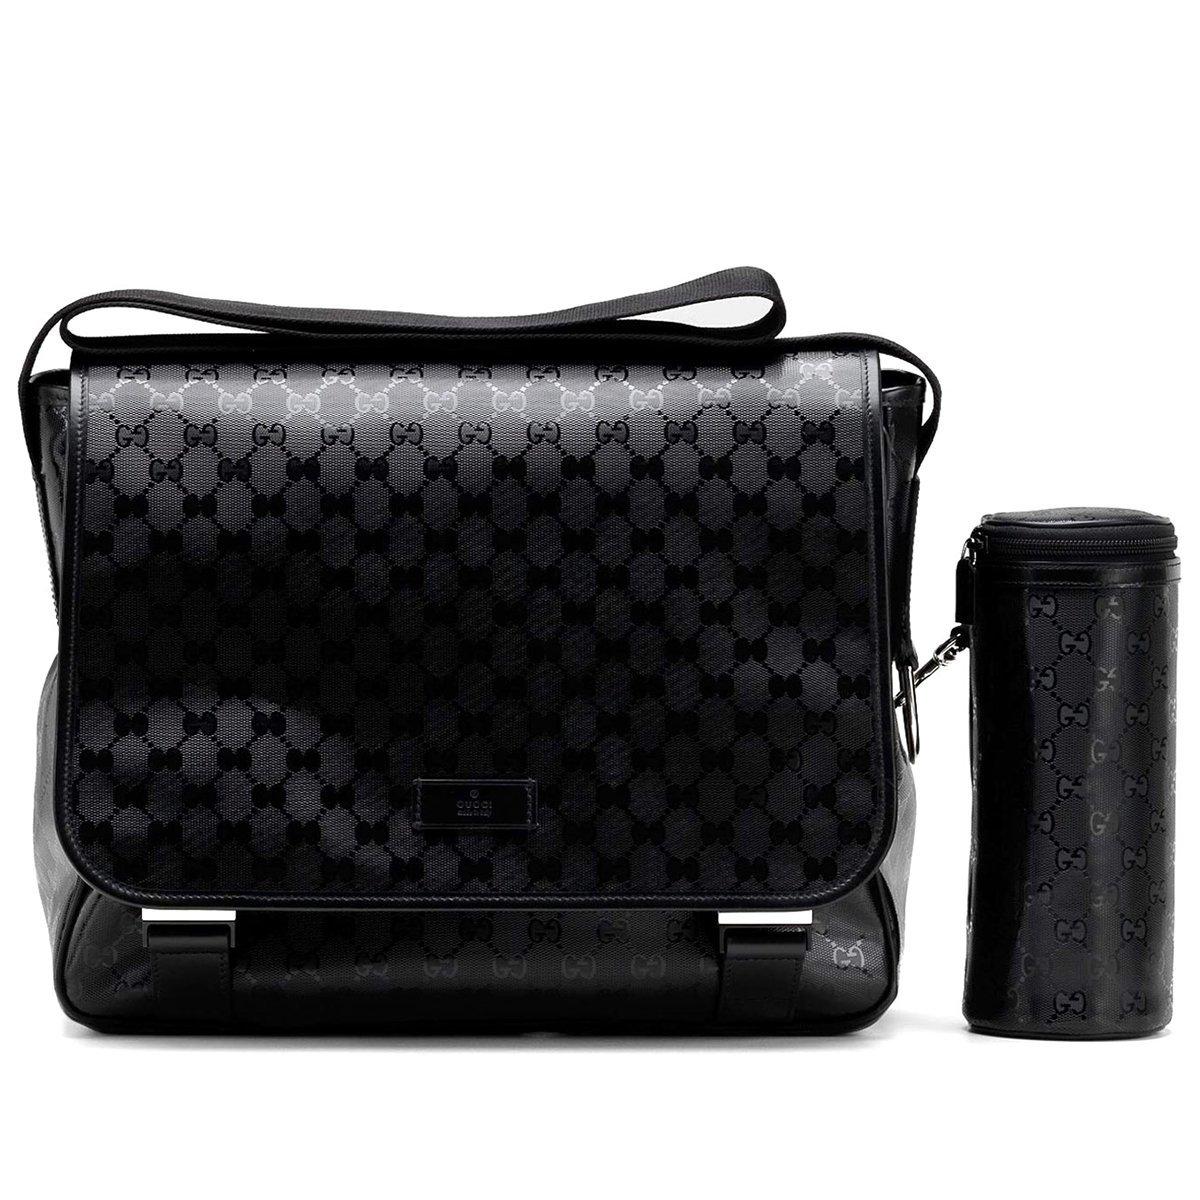 216cf062709d Amazon.com : Gucci Mama's Bag Black Imprime Leather Gg Logo Baby Diaper Bag  270794 : Baby